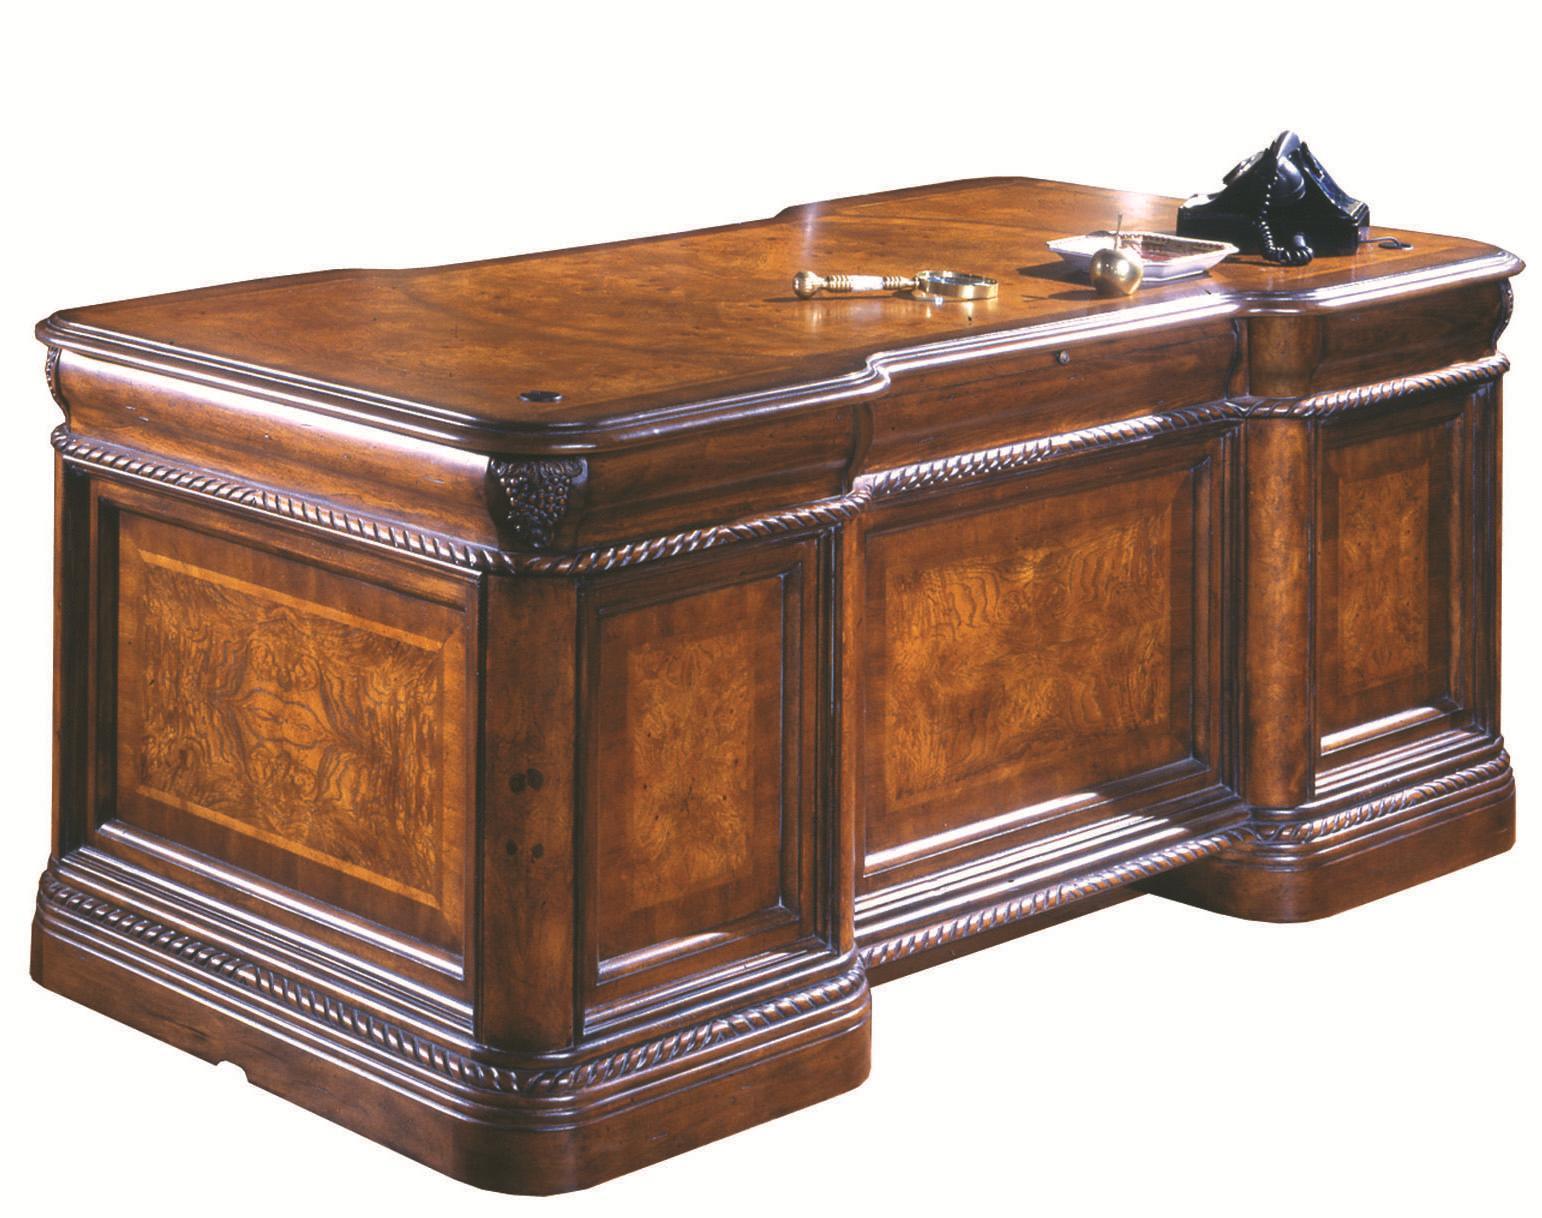 Aspenhome Napa  Napa 72-Inch Executive Desk  - Item Number: I74-300